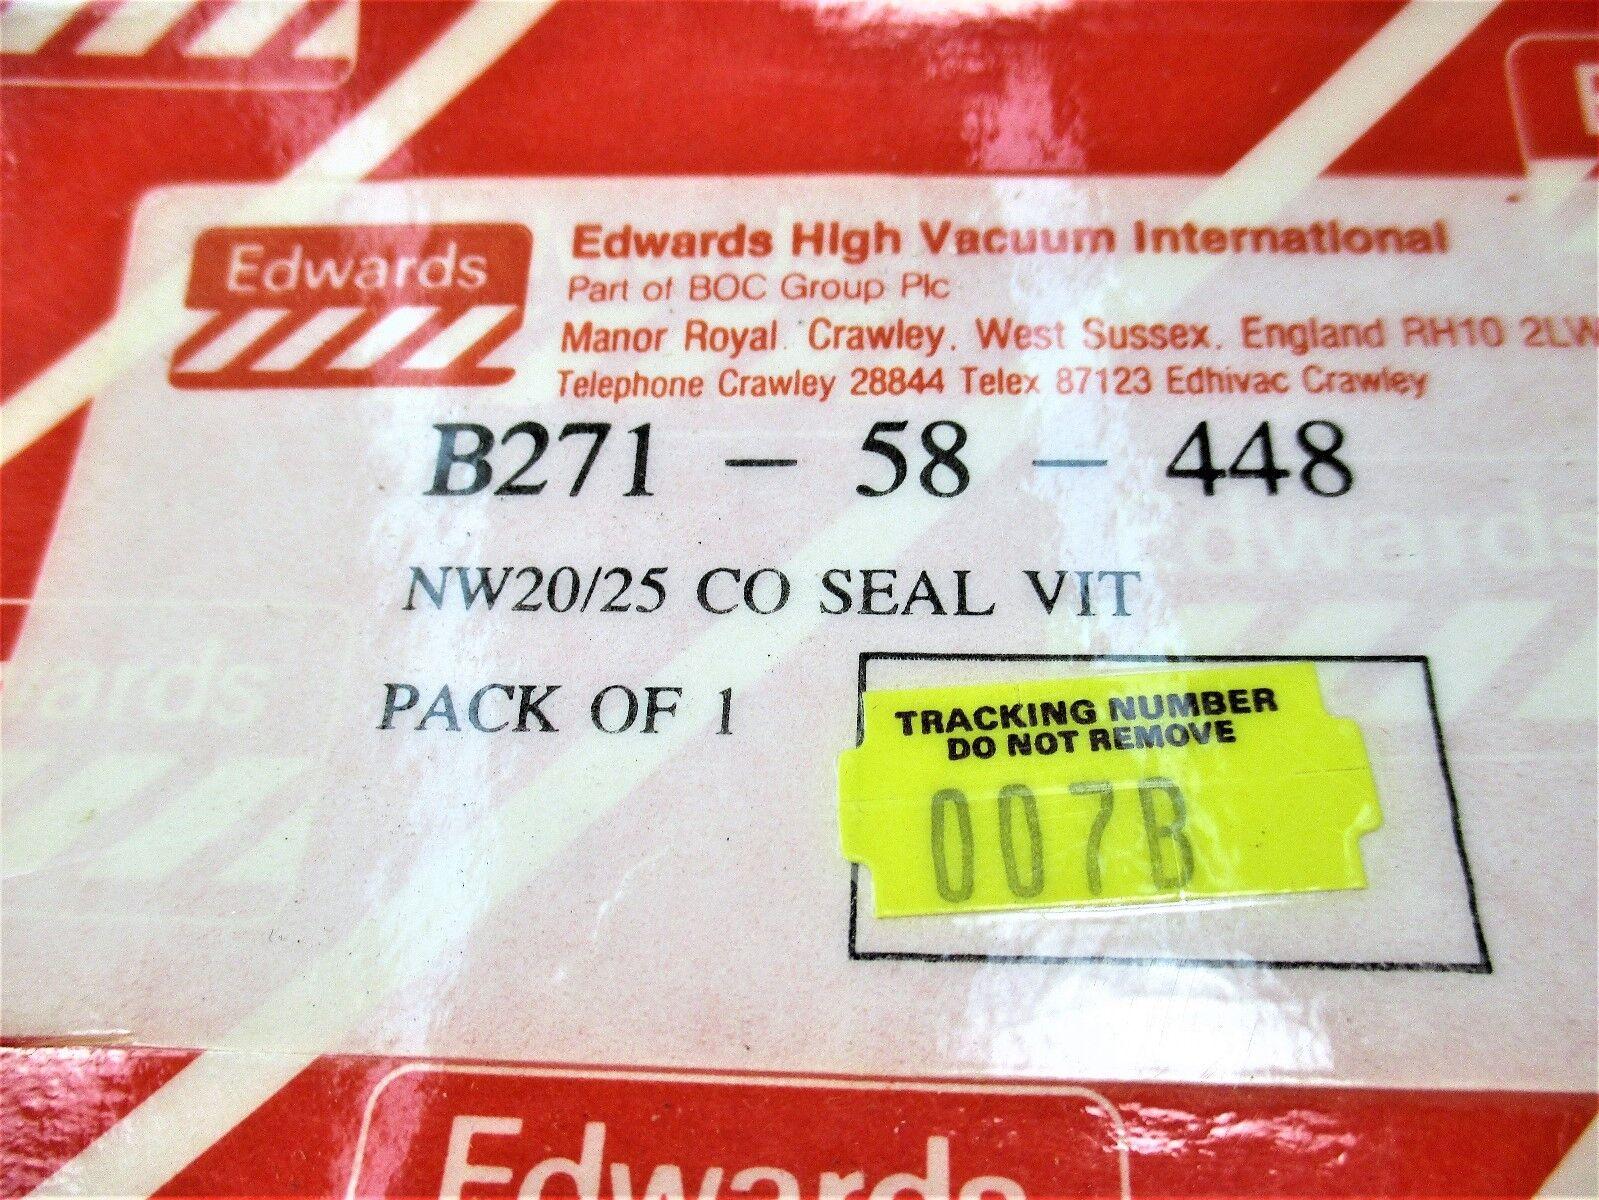 Seal Edwards B271-58-448 COSEAL Nw20/25 VIT Ny66 Bk